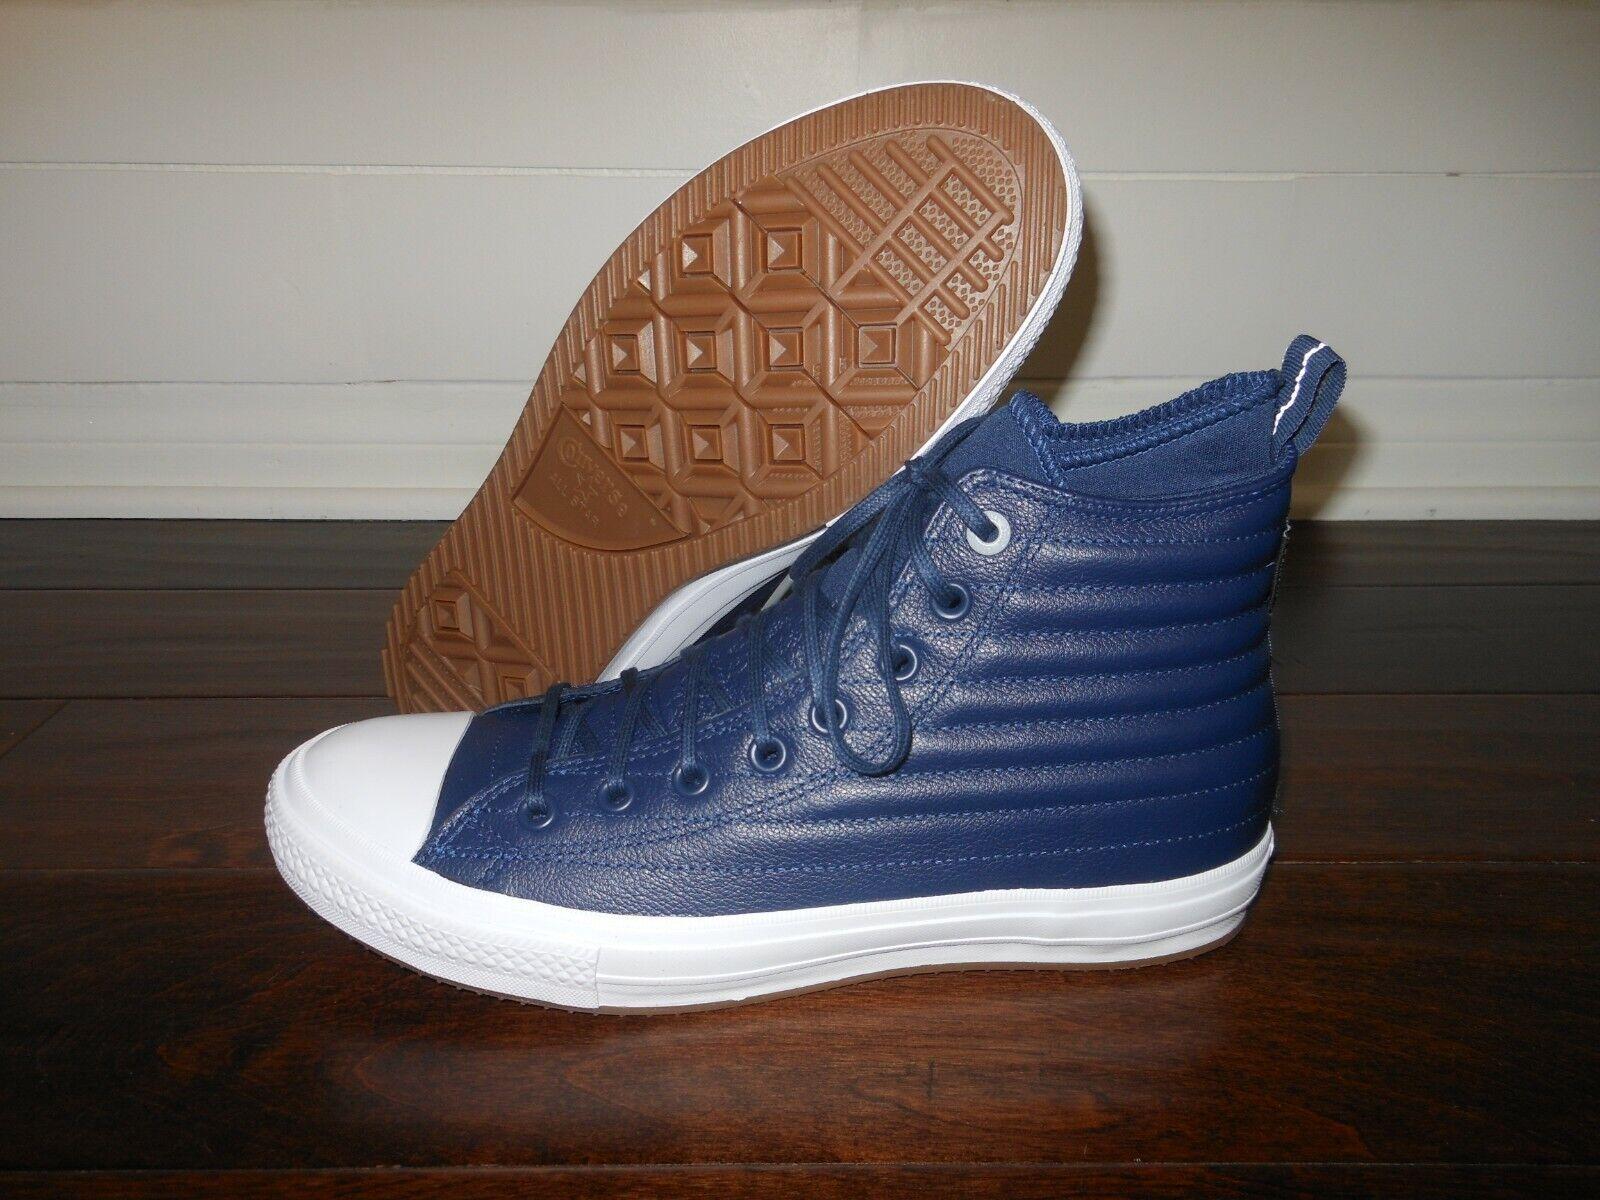 CONVERSE CTAS WP Counter Climate Leather Boots Hi 157490C Size 10 US 44 EUR Navy